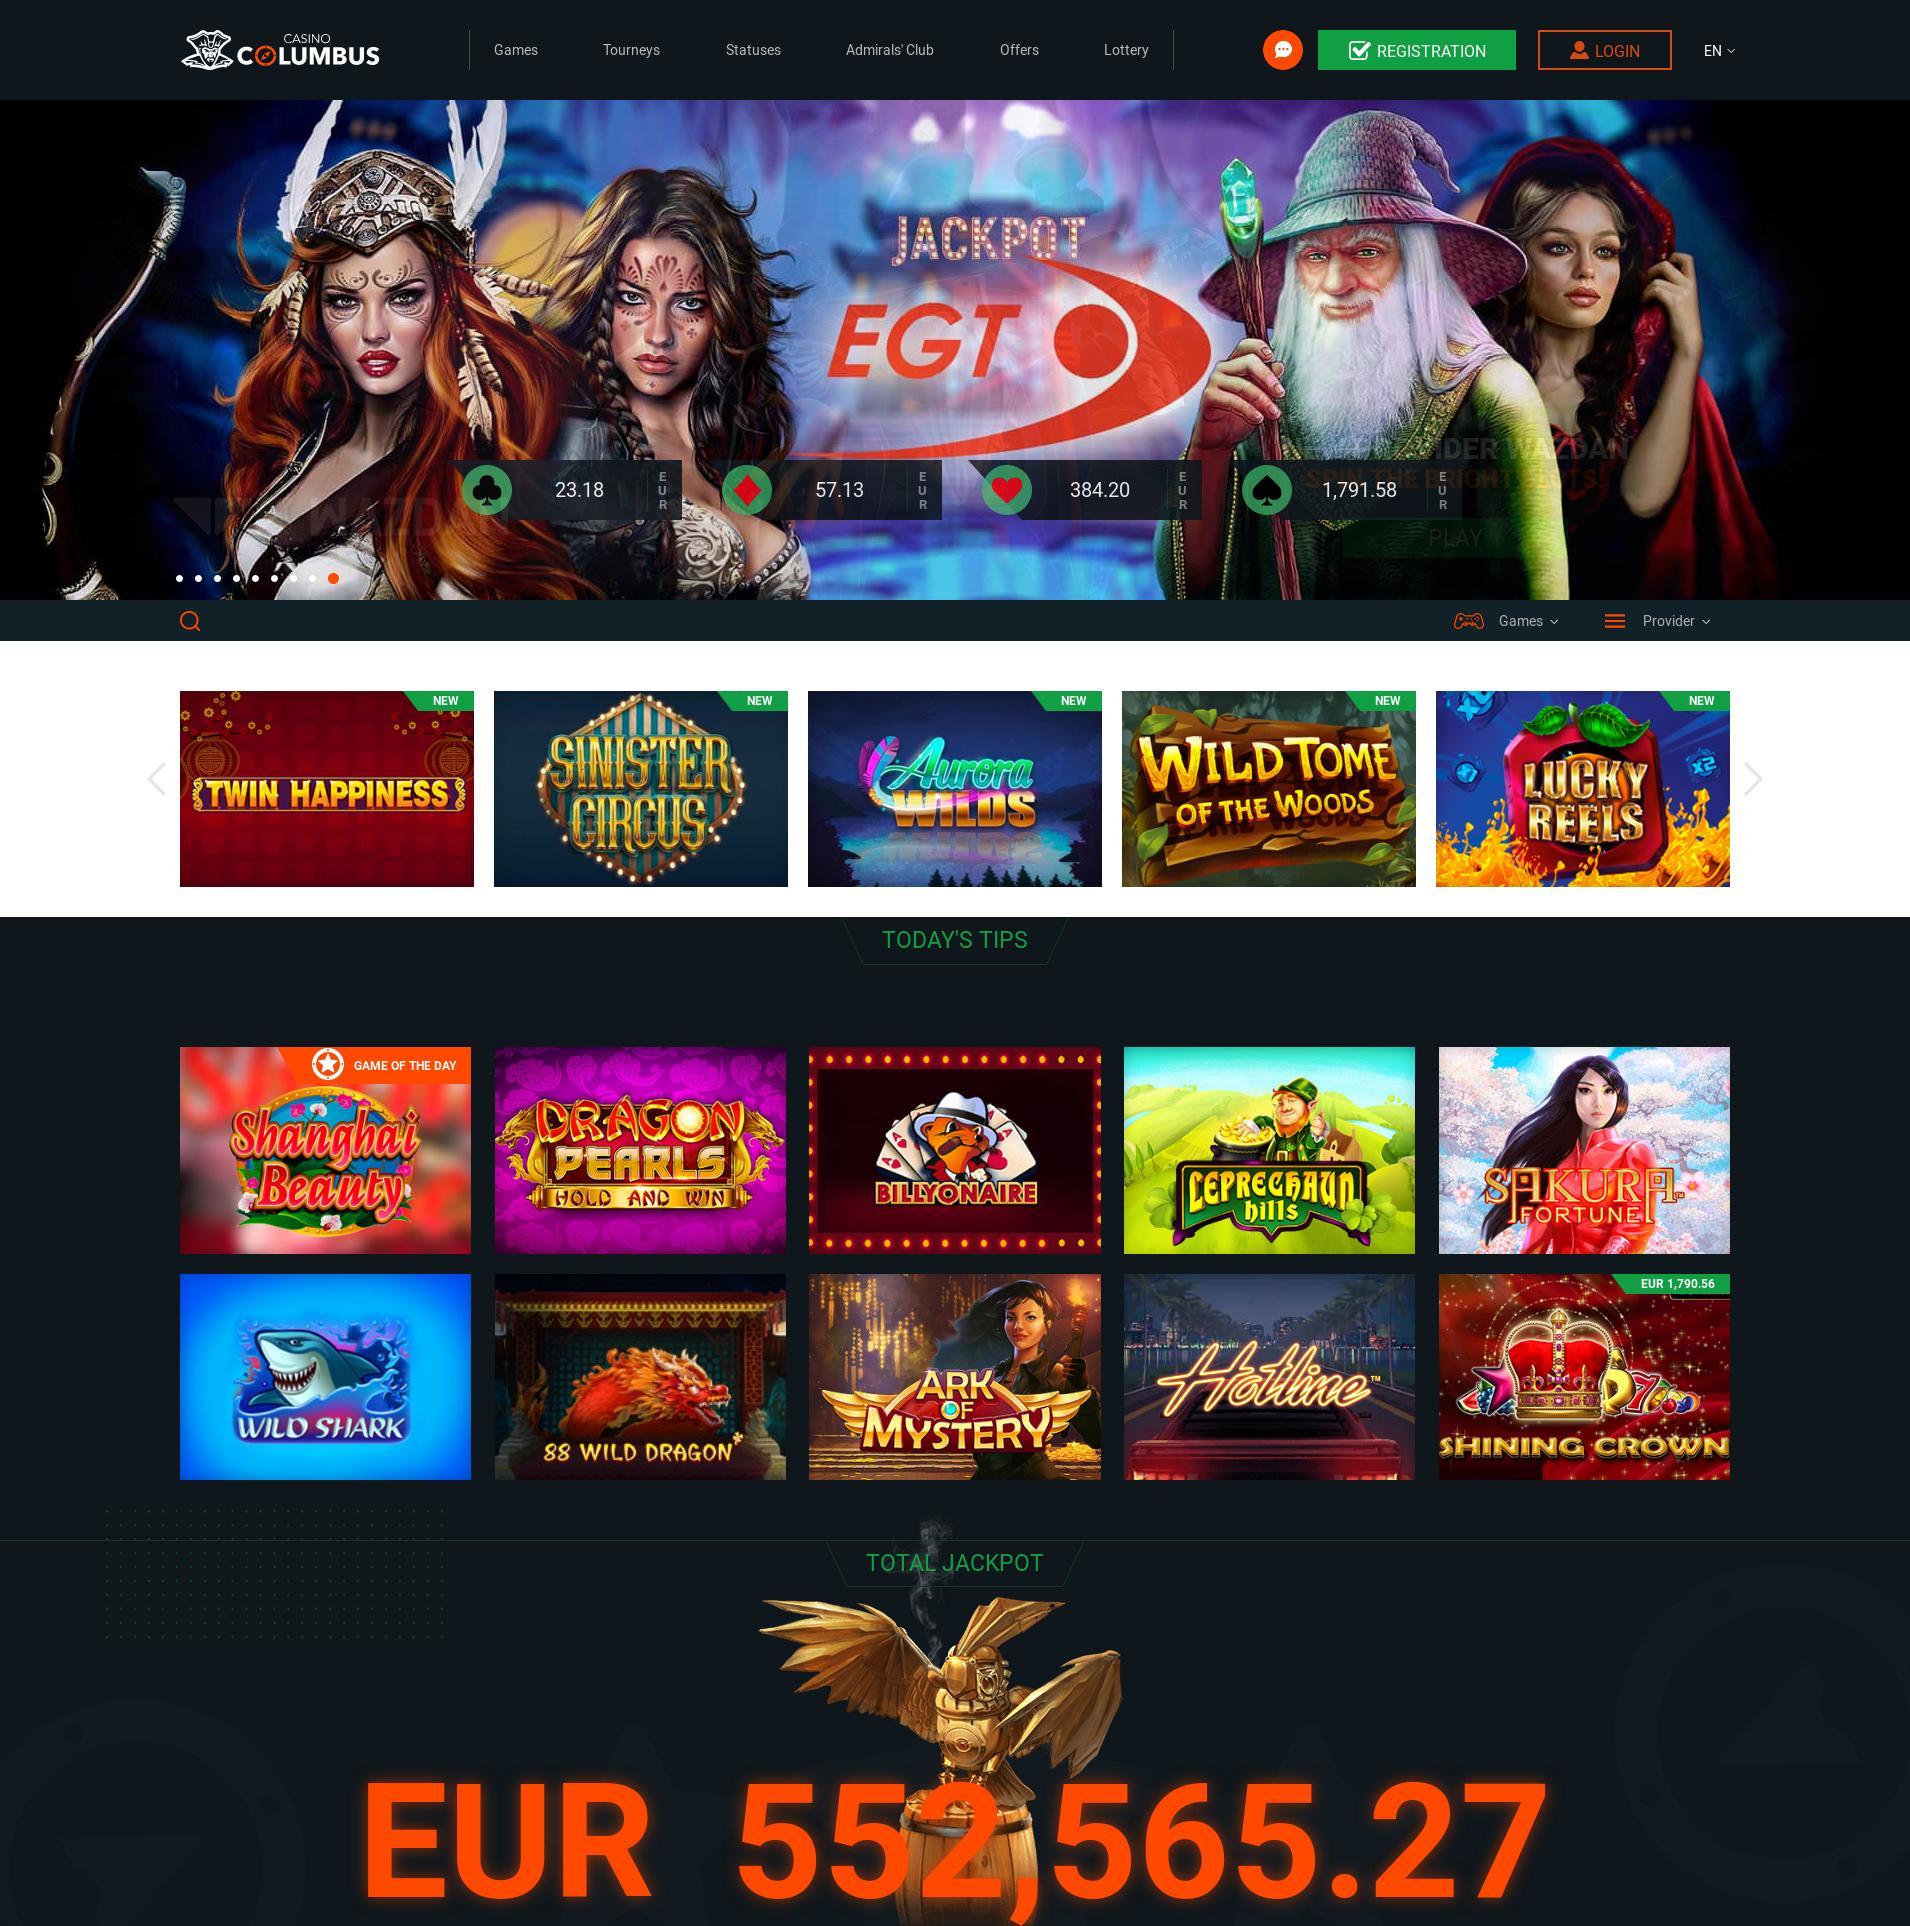 Casino screen Lobby 2019-09-18 for Czech Republic